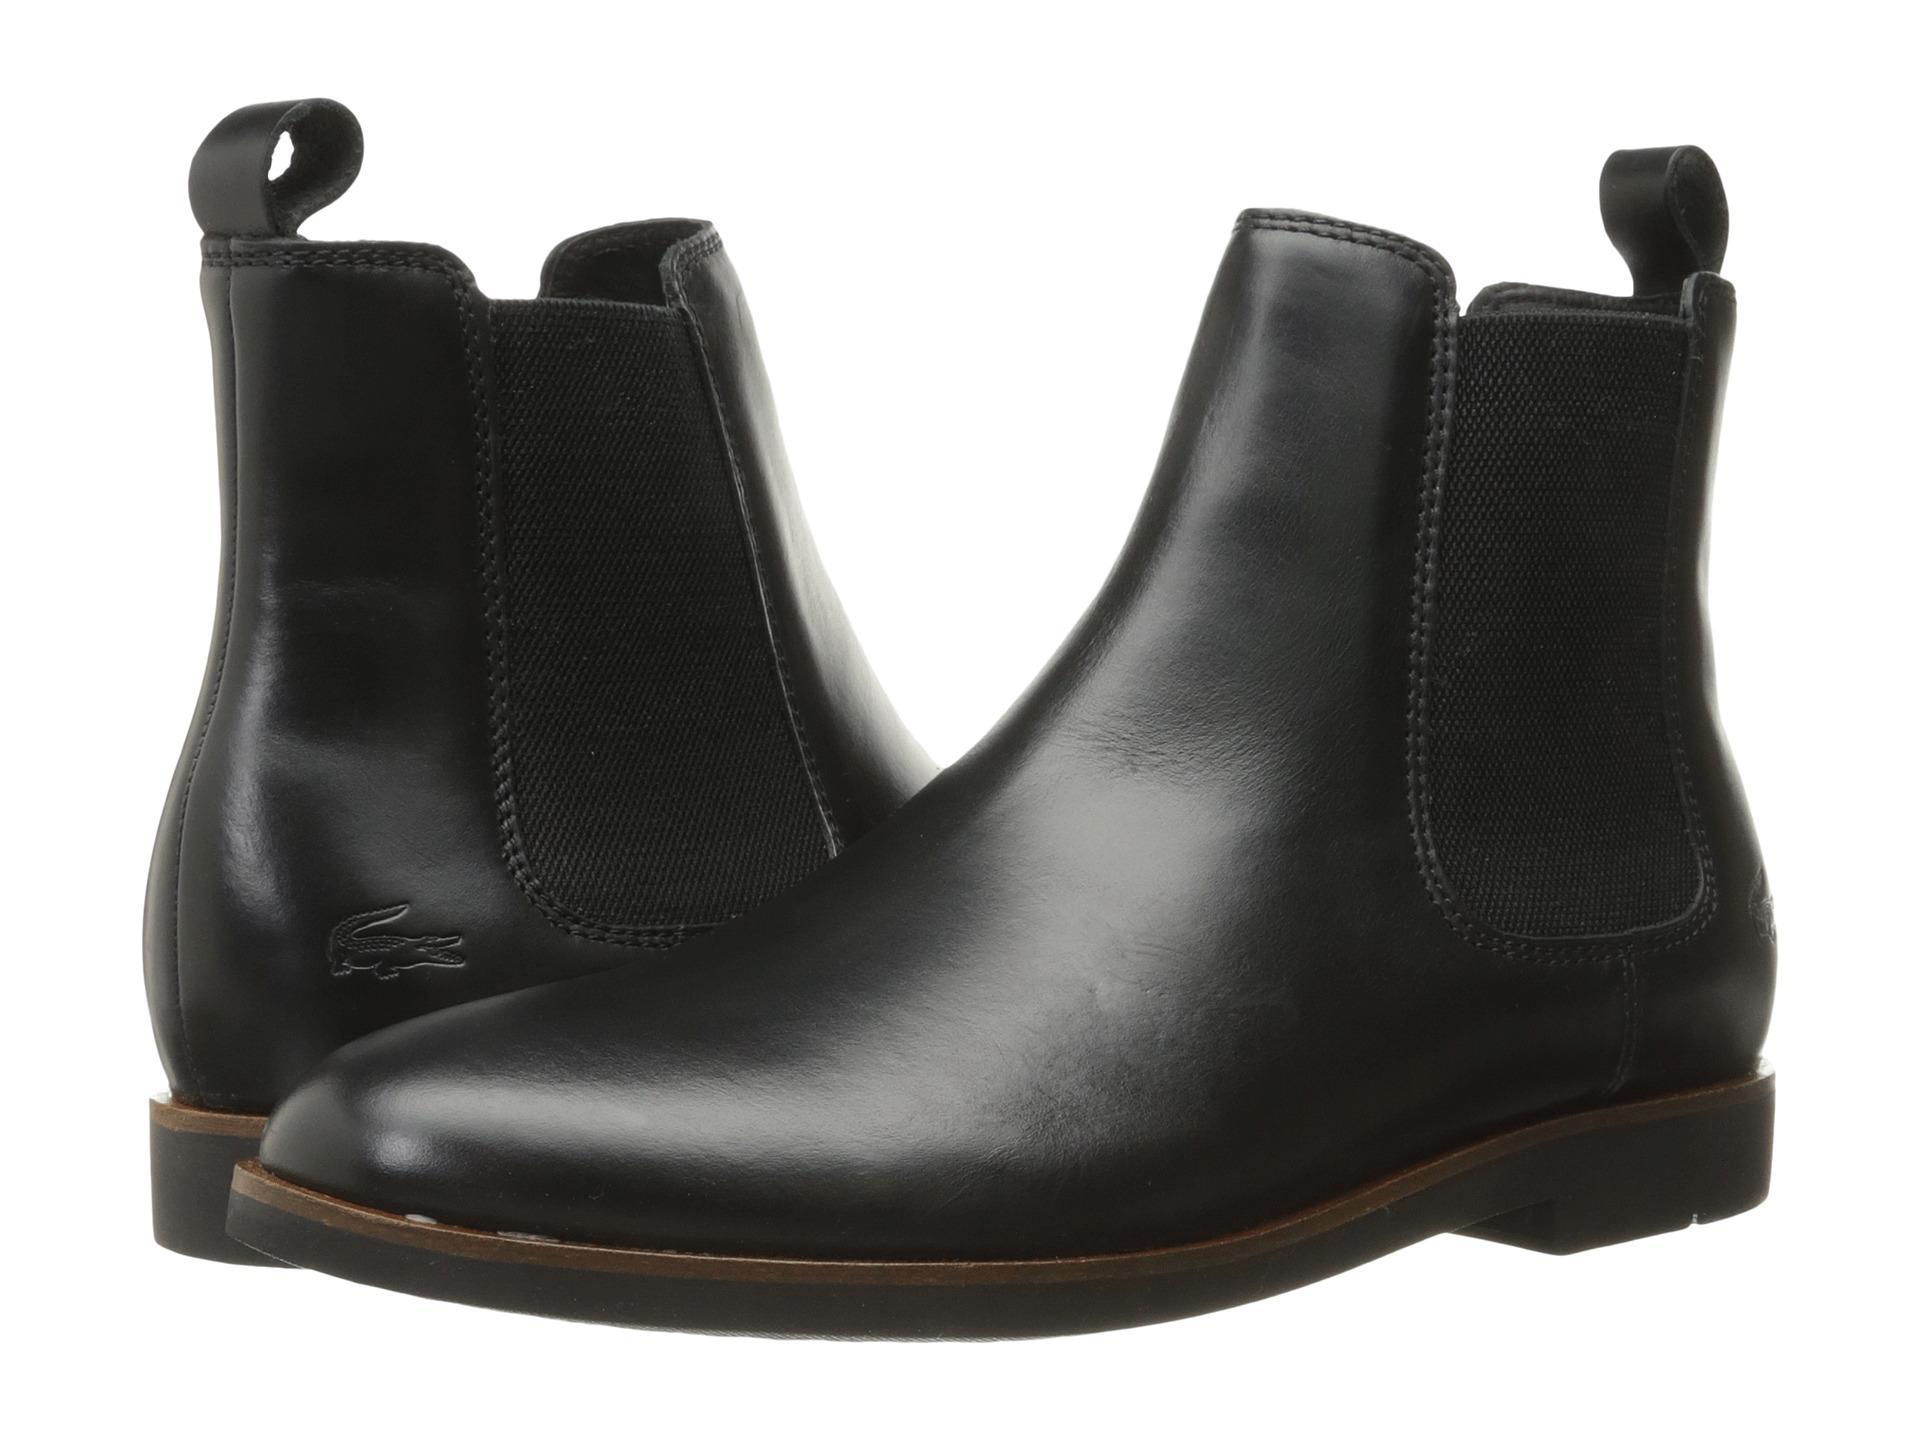 e6ee89958edb13 Lyst - Lacoste Crosley 316 1 Cam Chelsea Boot in Black for Men